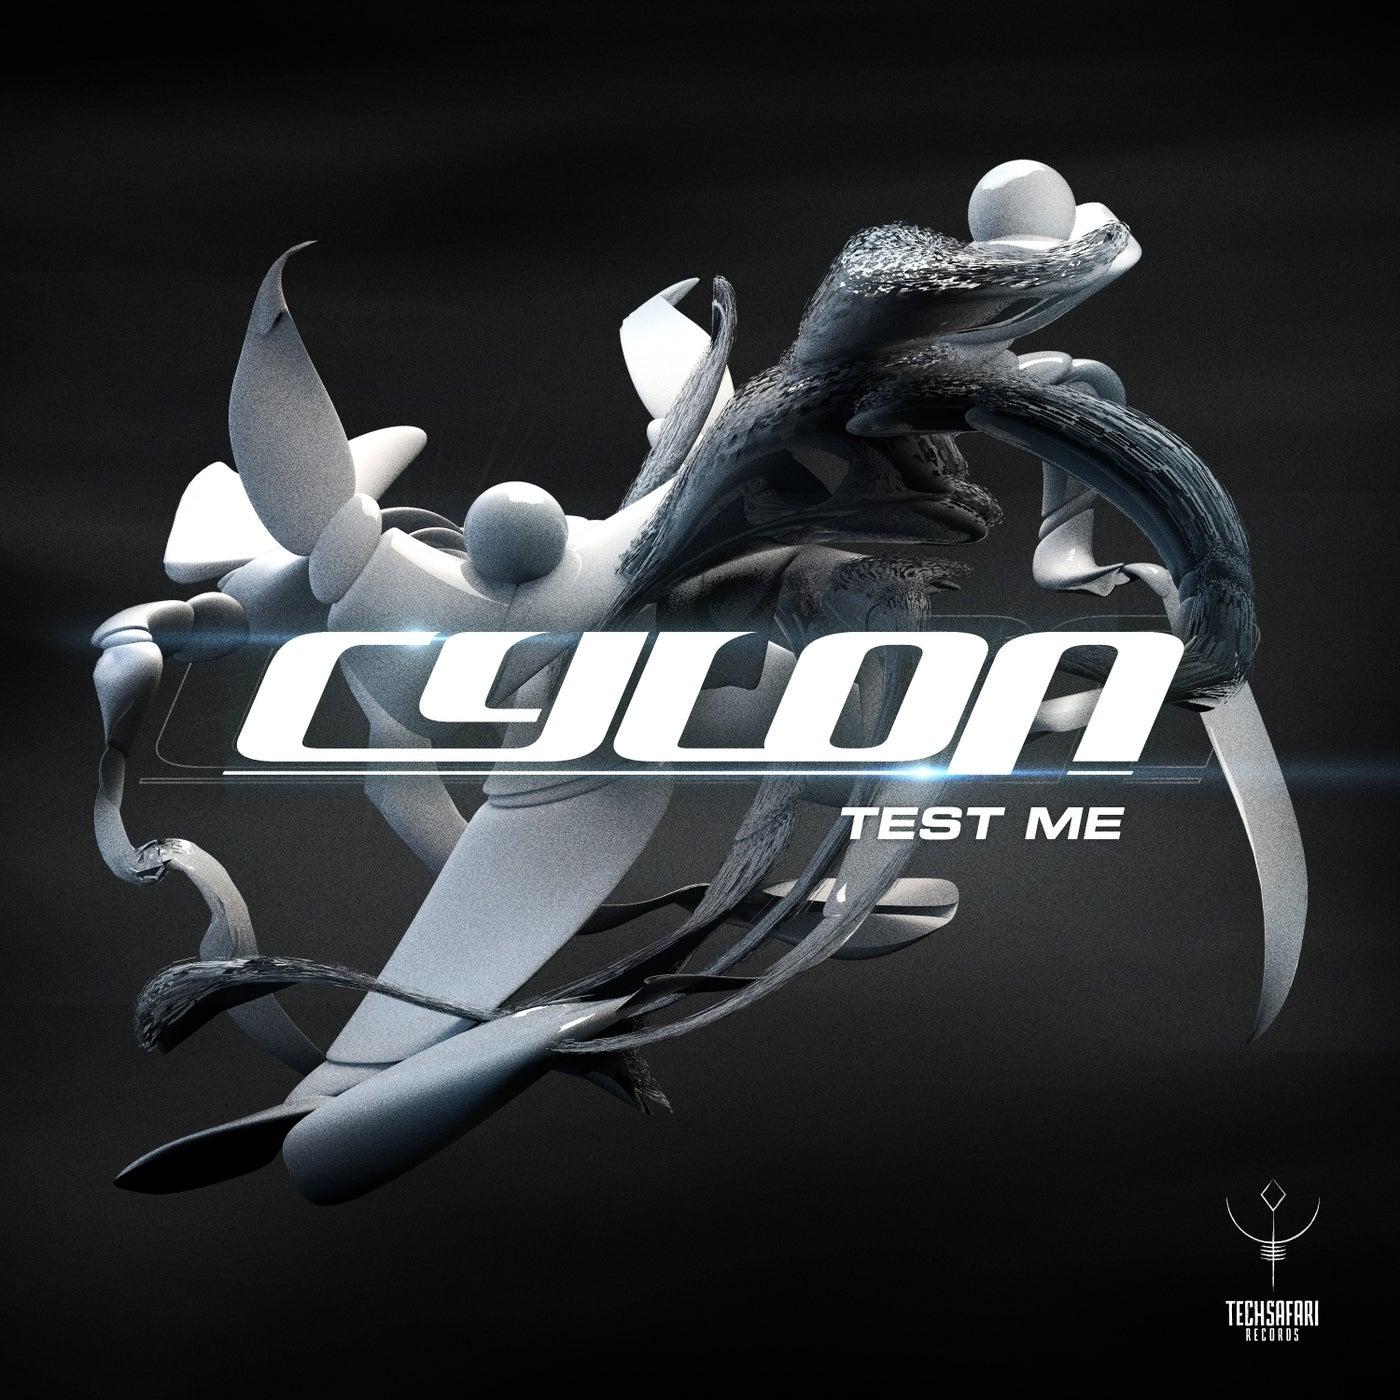 Test Me (Original Mix)